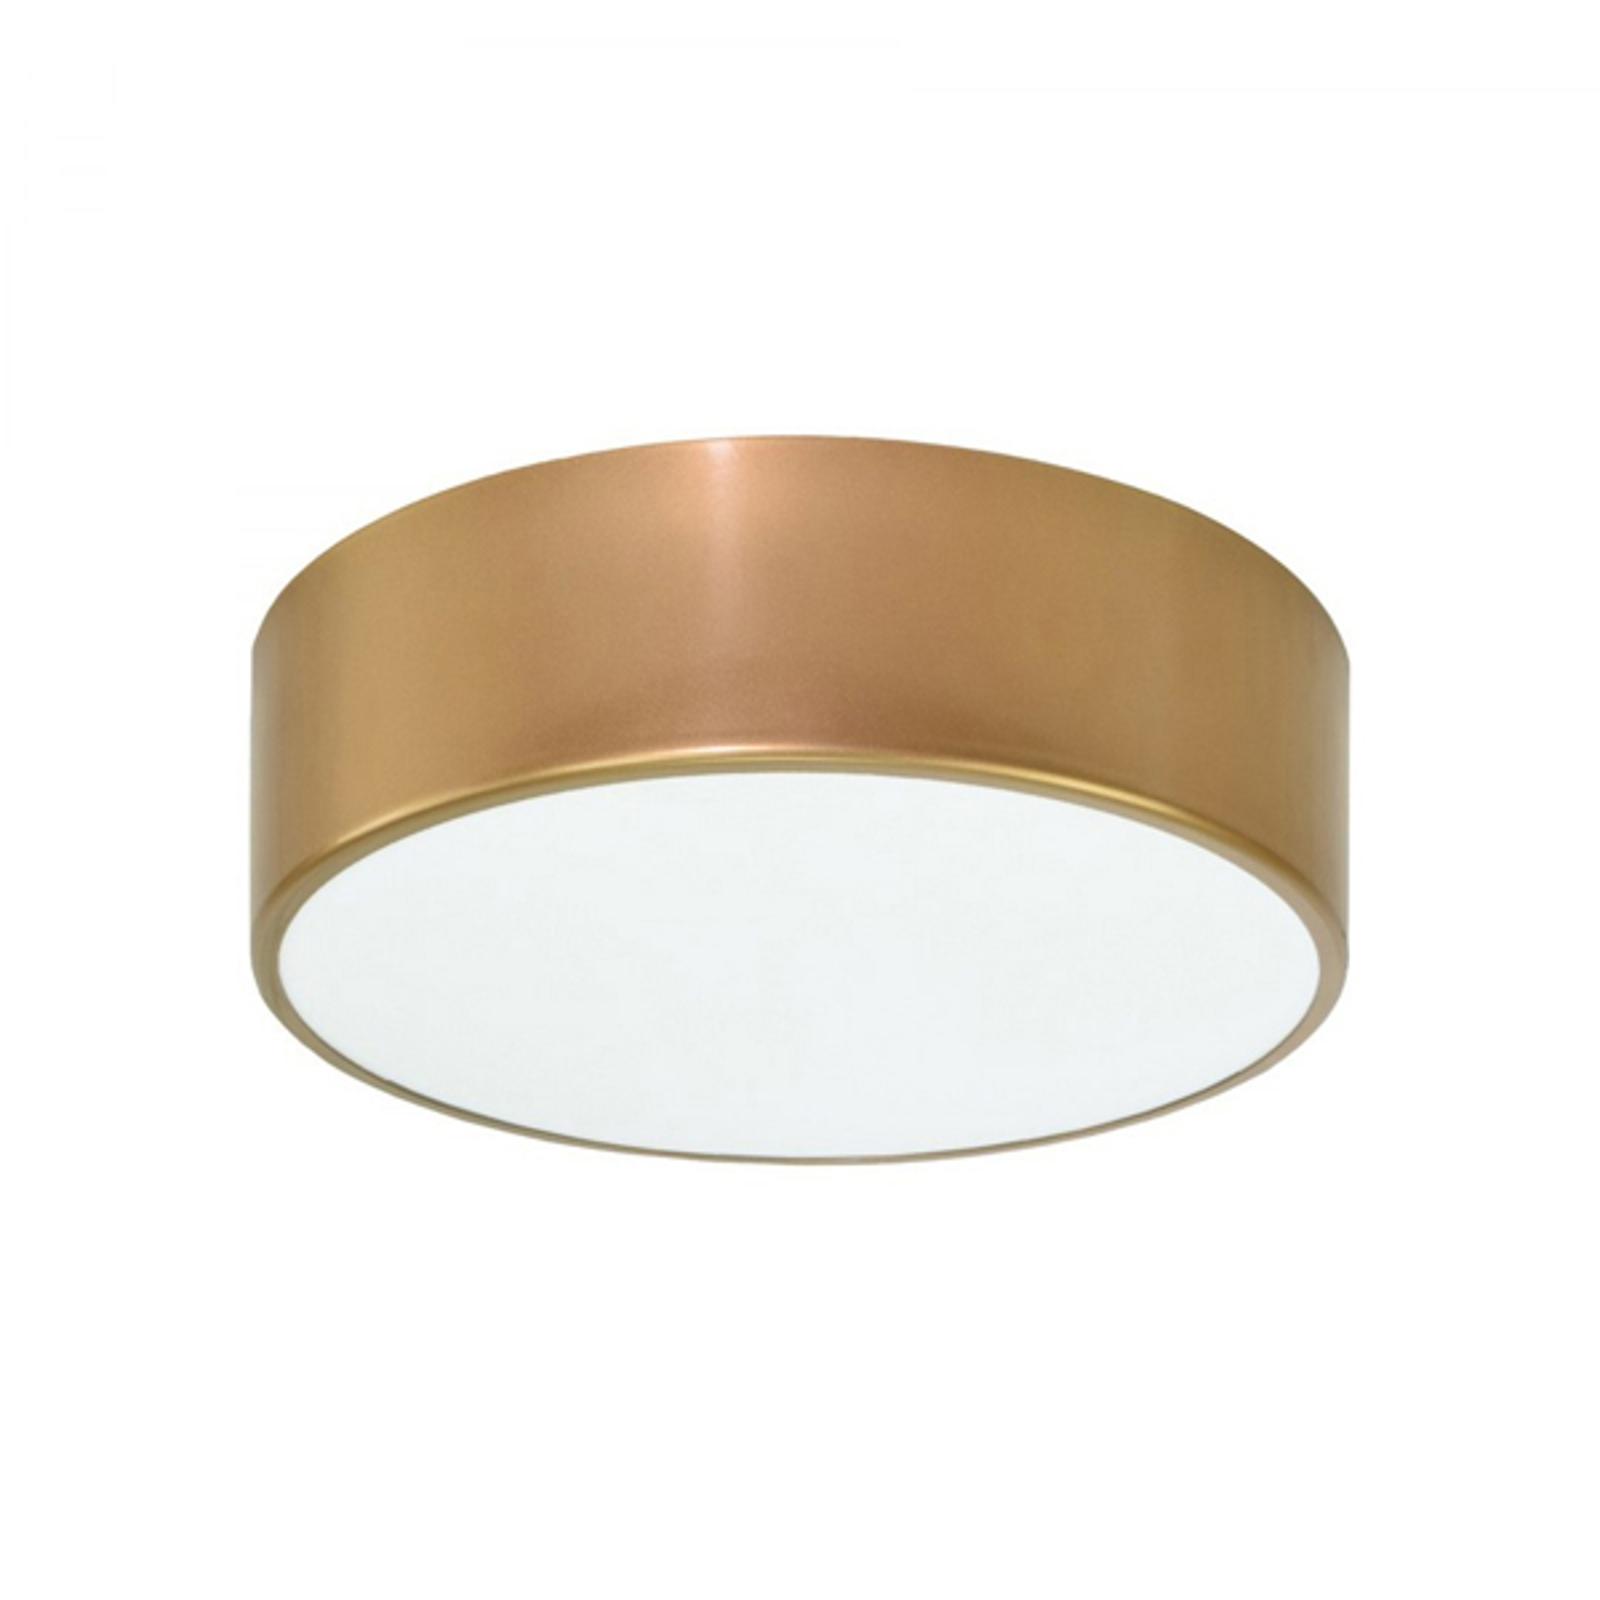 Taklampe Cleo Ø 20 cm, gull